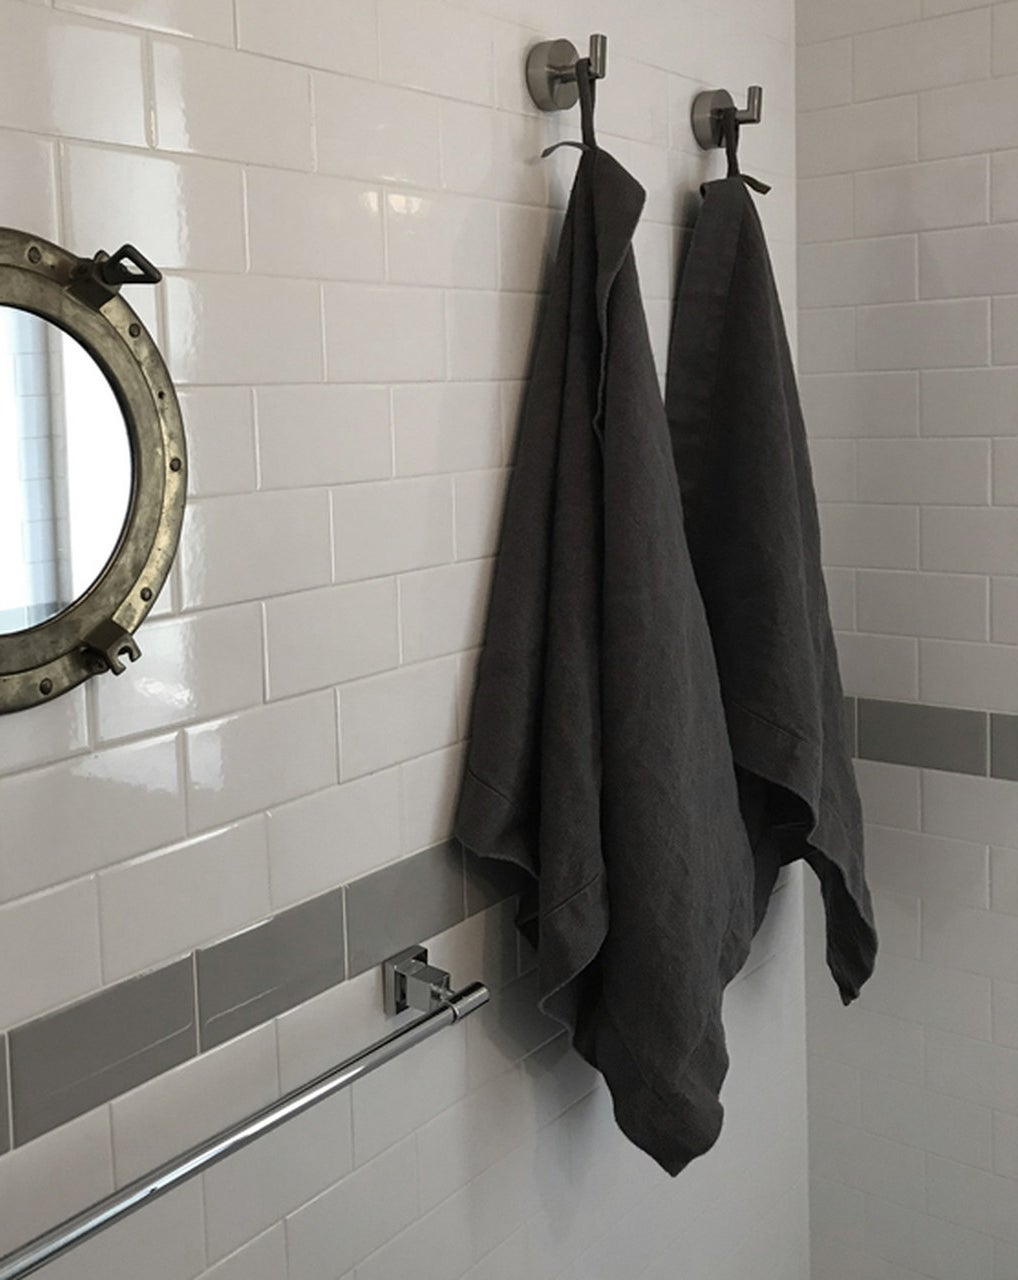 two dark grey linen bath sheets hangin on hooks